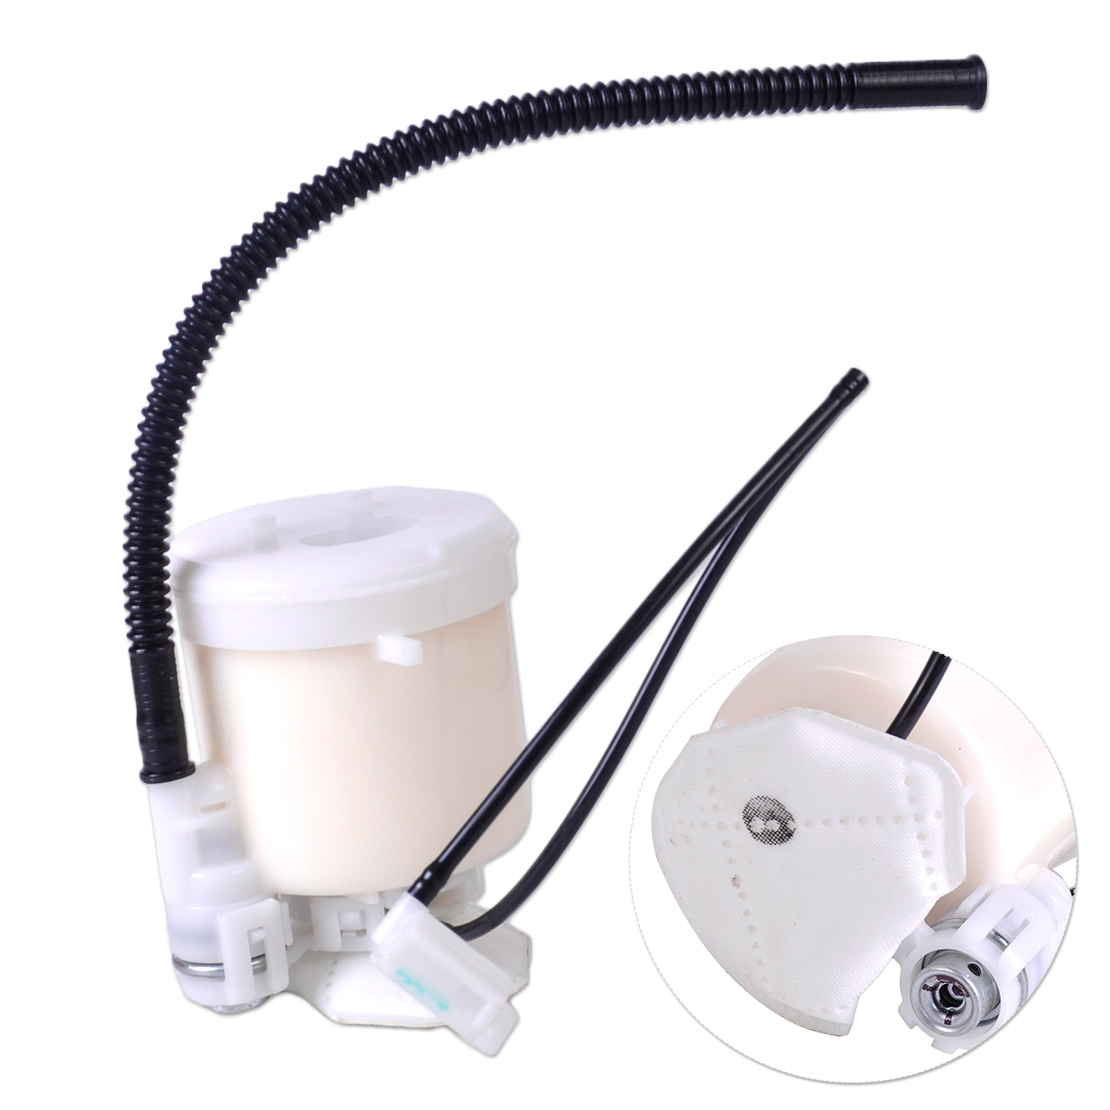 hight resolution of 2006 corolla fuel filter